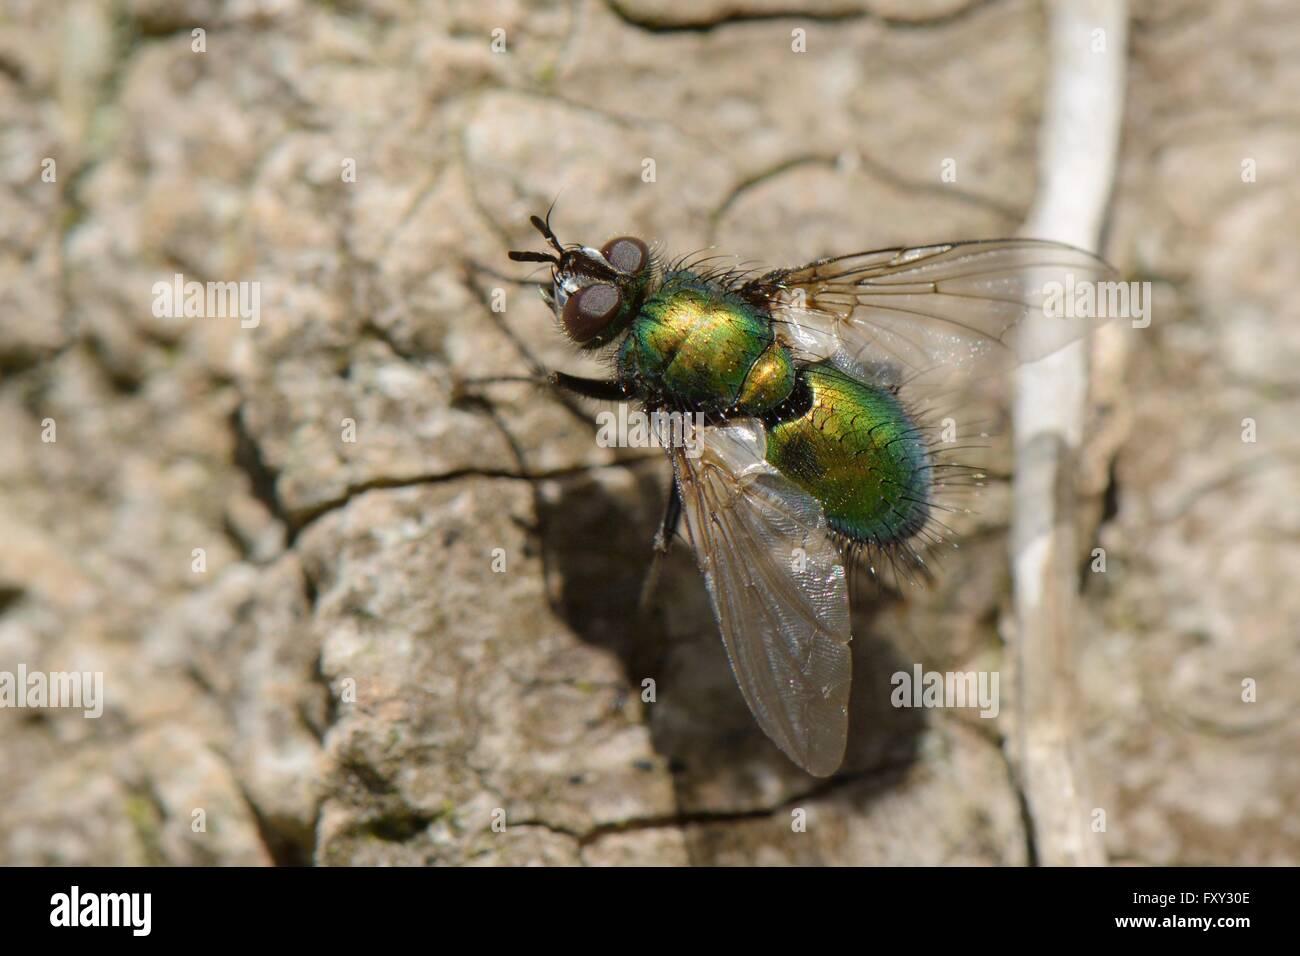 Parasite fly / Tachinid fly (Gymnocheta viridis), a parasite of lepidopteran caterpillars, sunning on a tree trunk, - Stock Image